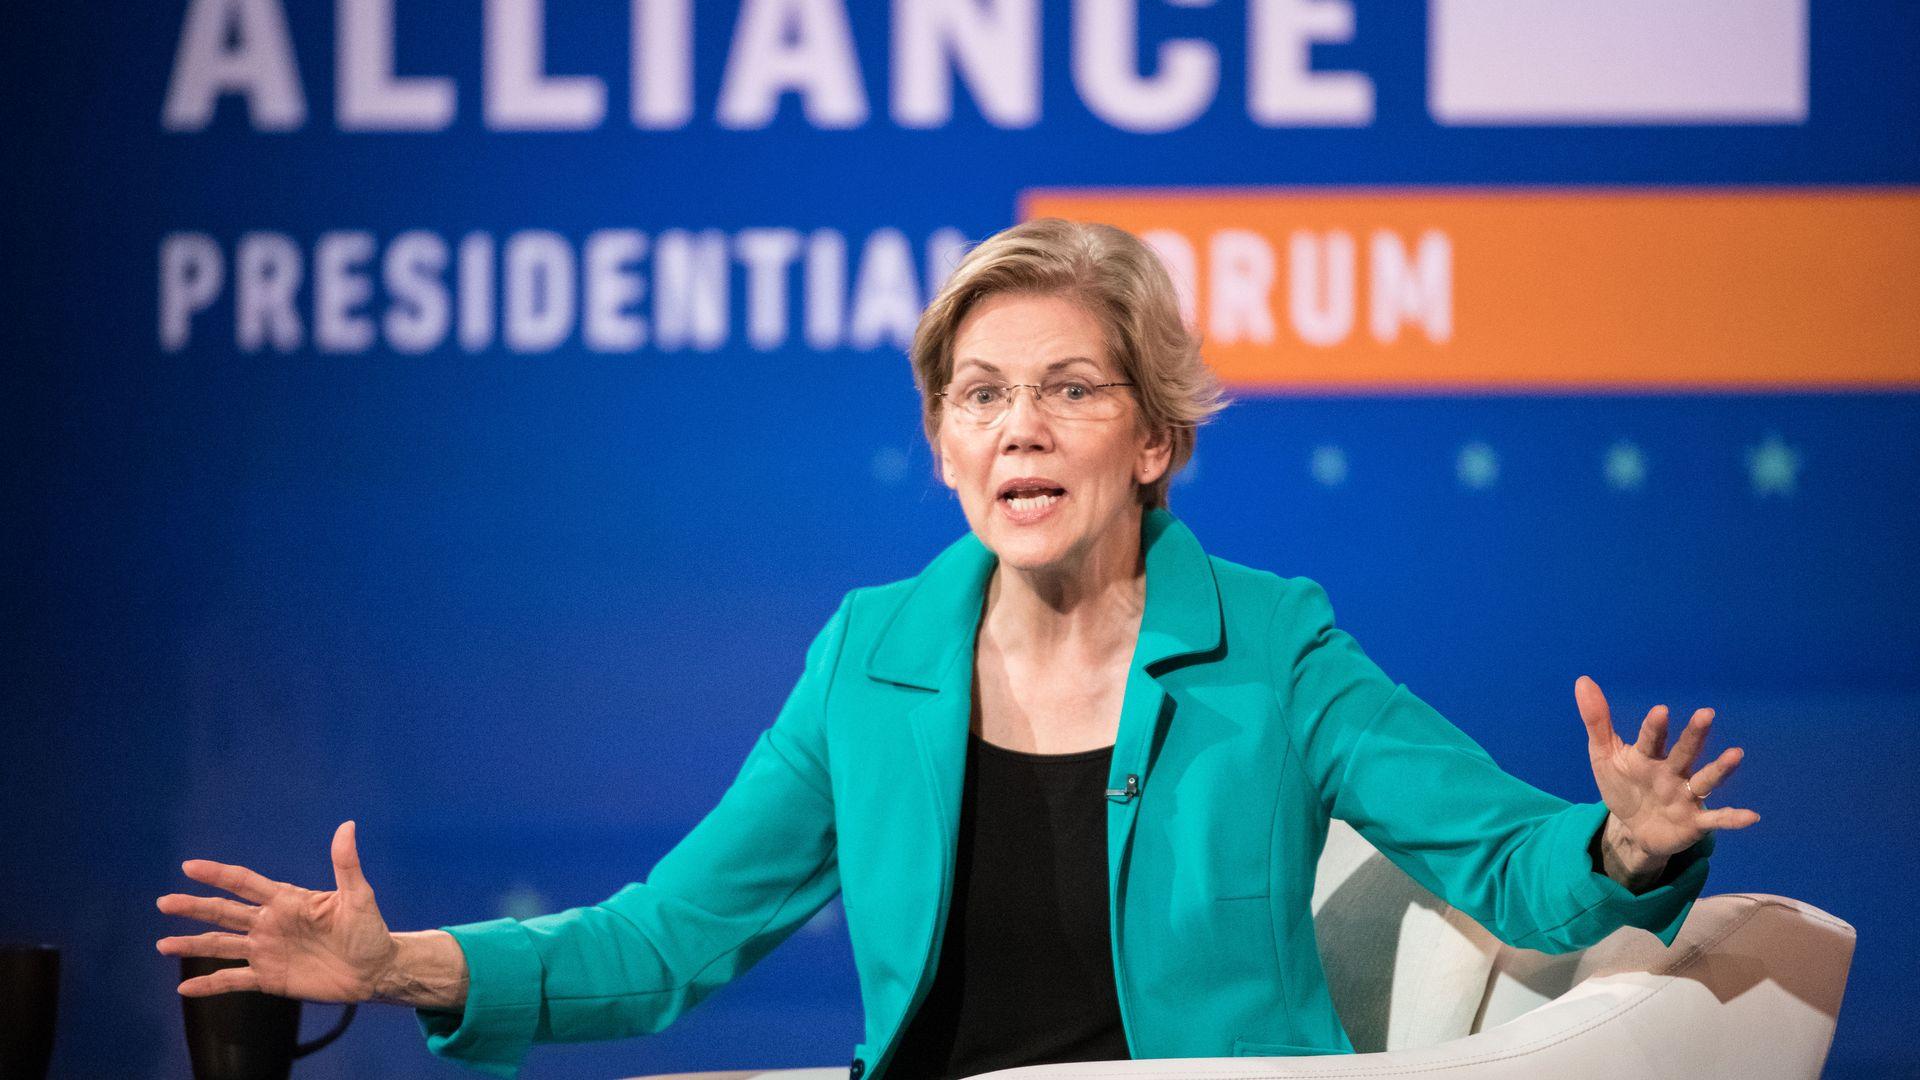 Democratic presidential candidate Sen. Elizabeth Warren (D-MA) participates in the Black Economic Alliance Forum at the Charleston Music Hall on June 15, 2019 in Charleston, South Carolina.